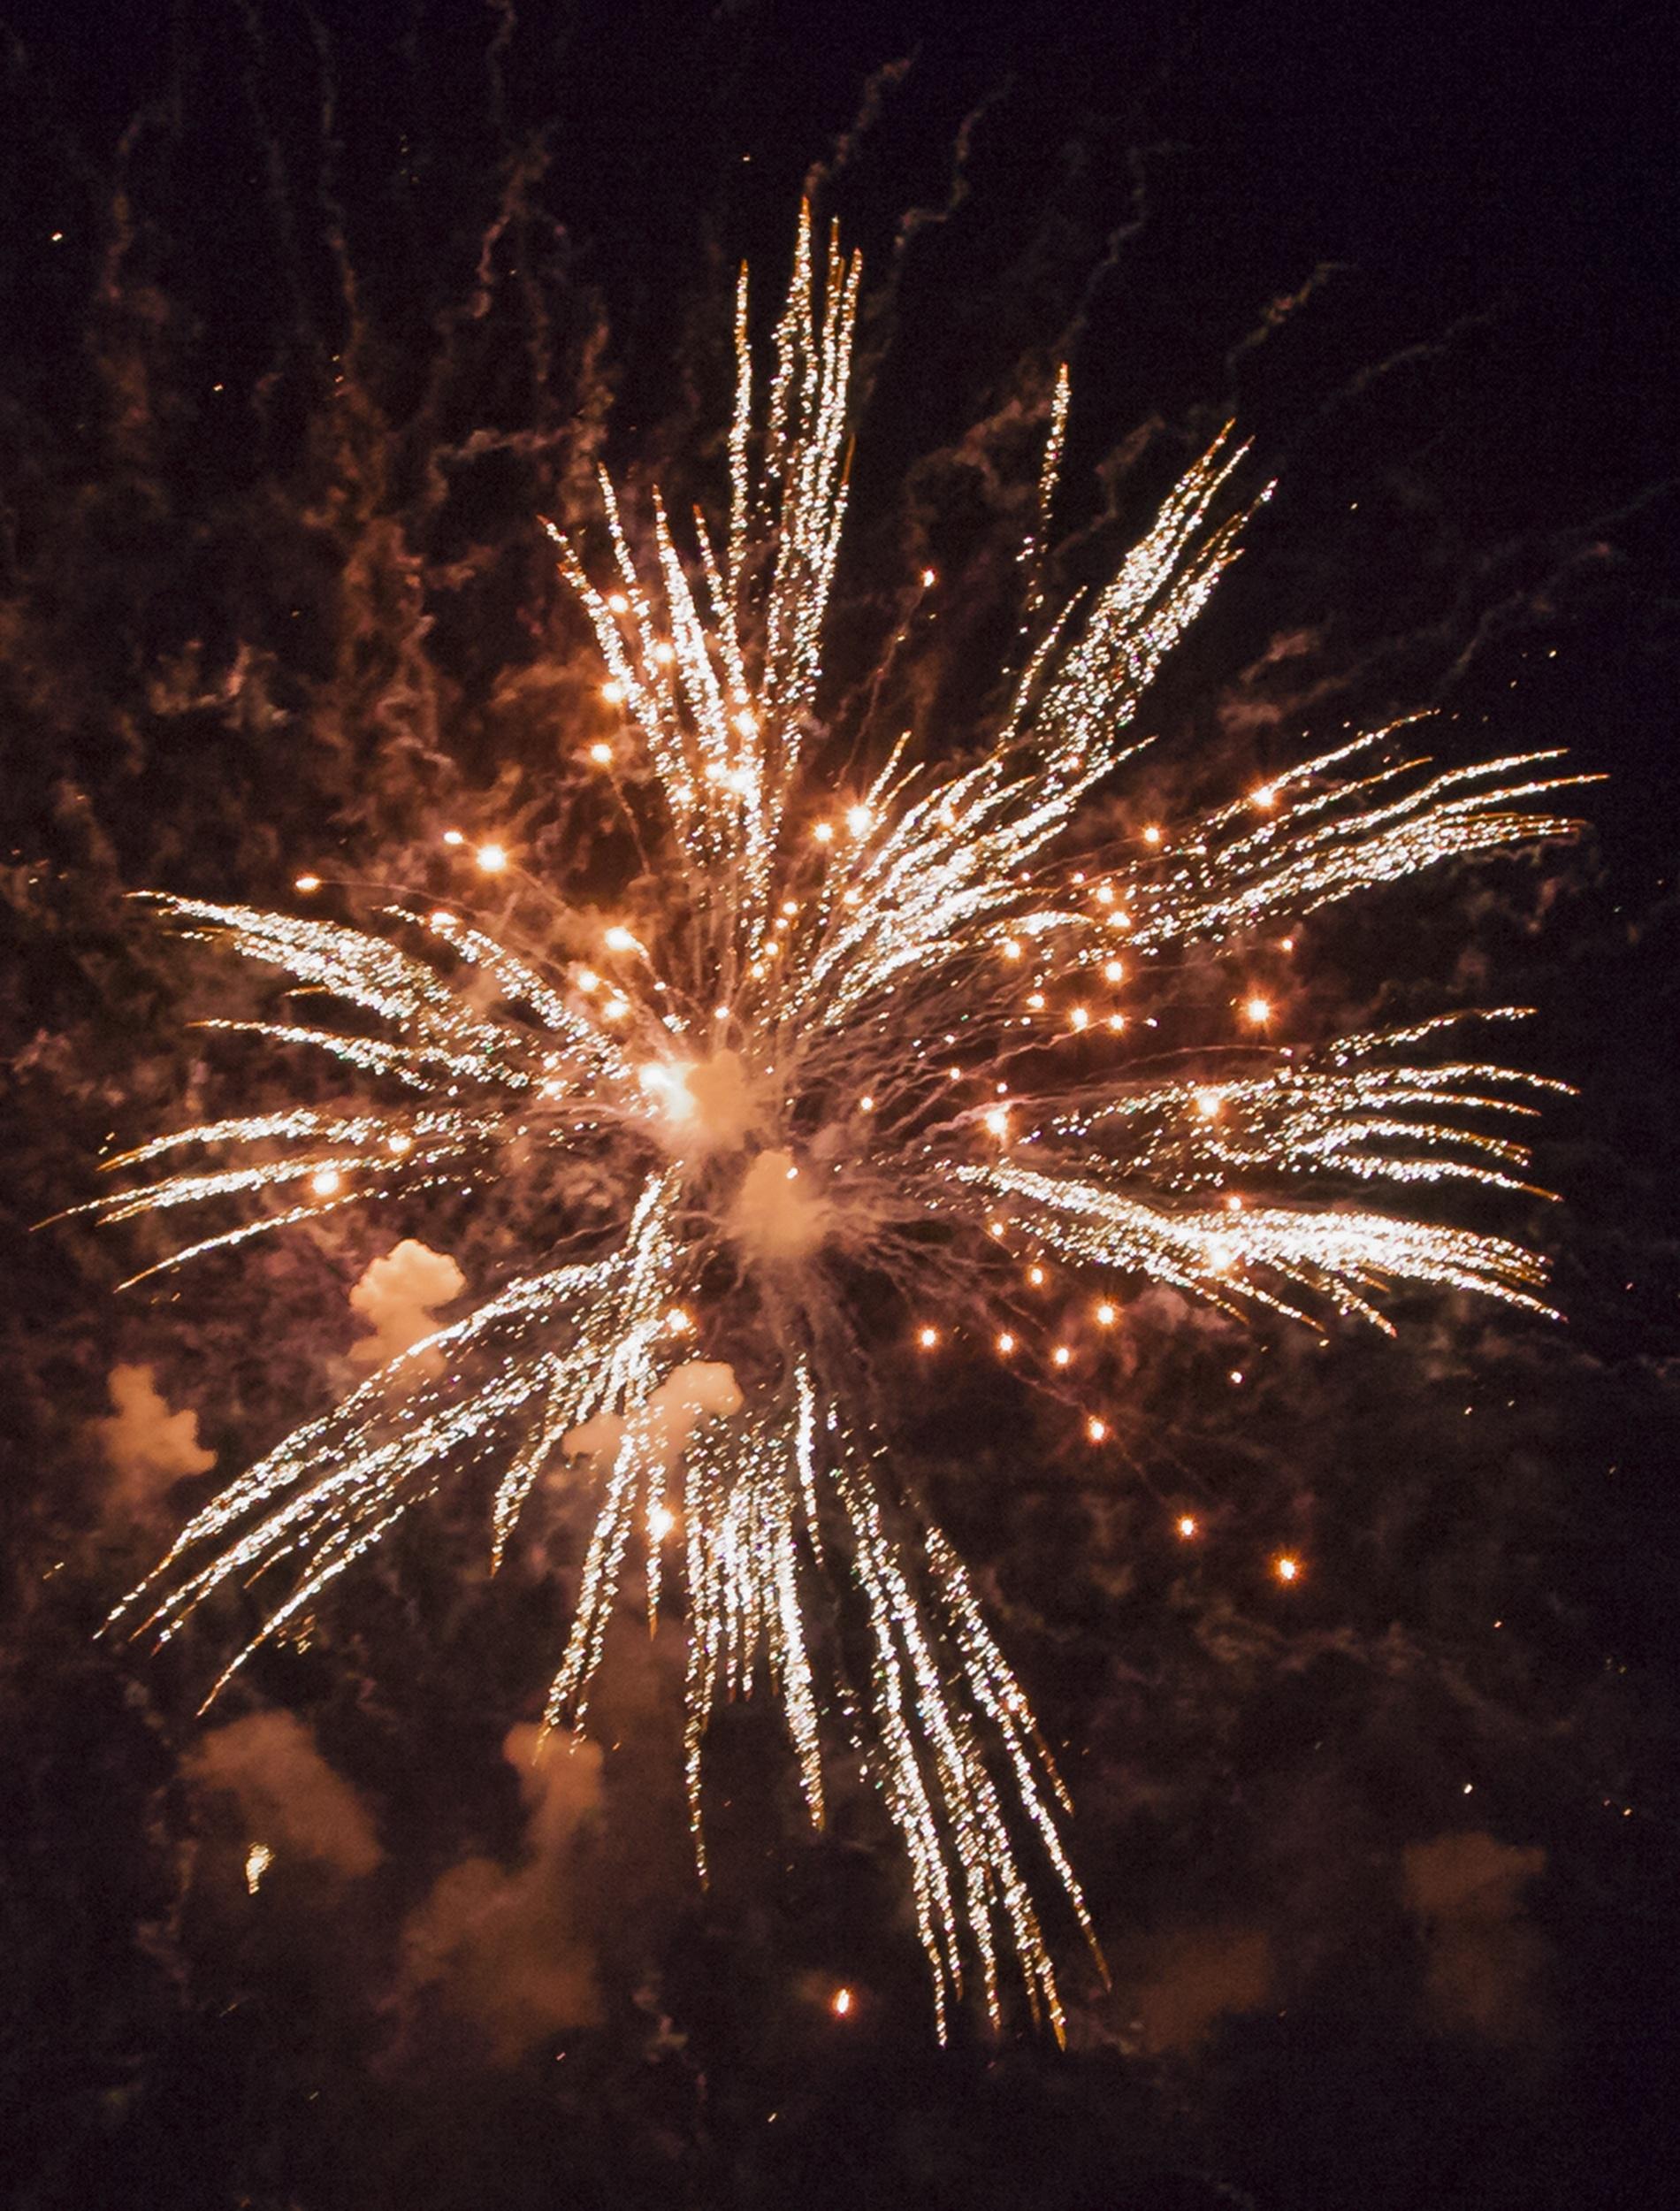 Gambar langit bintang bunga kegelapan tahun baru kembang gambar langit bintang bunga kegelapan tahun baru kembang api pesta peristiwa tengah malam malam tahun baru selamat tahun baru tahun baru 2017 voltagebd Images